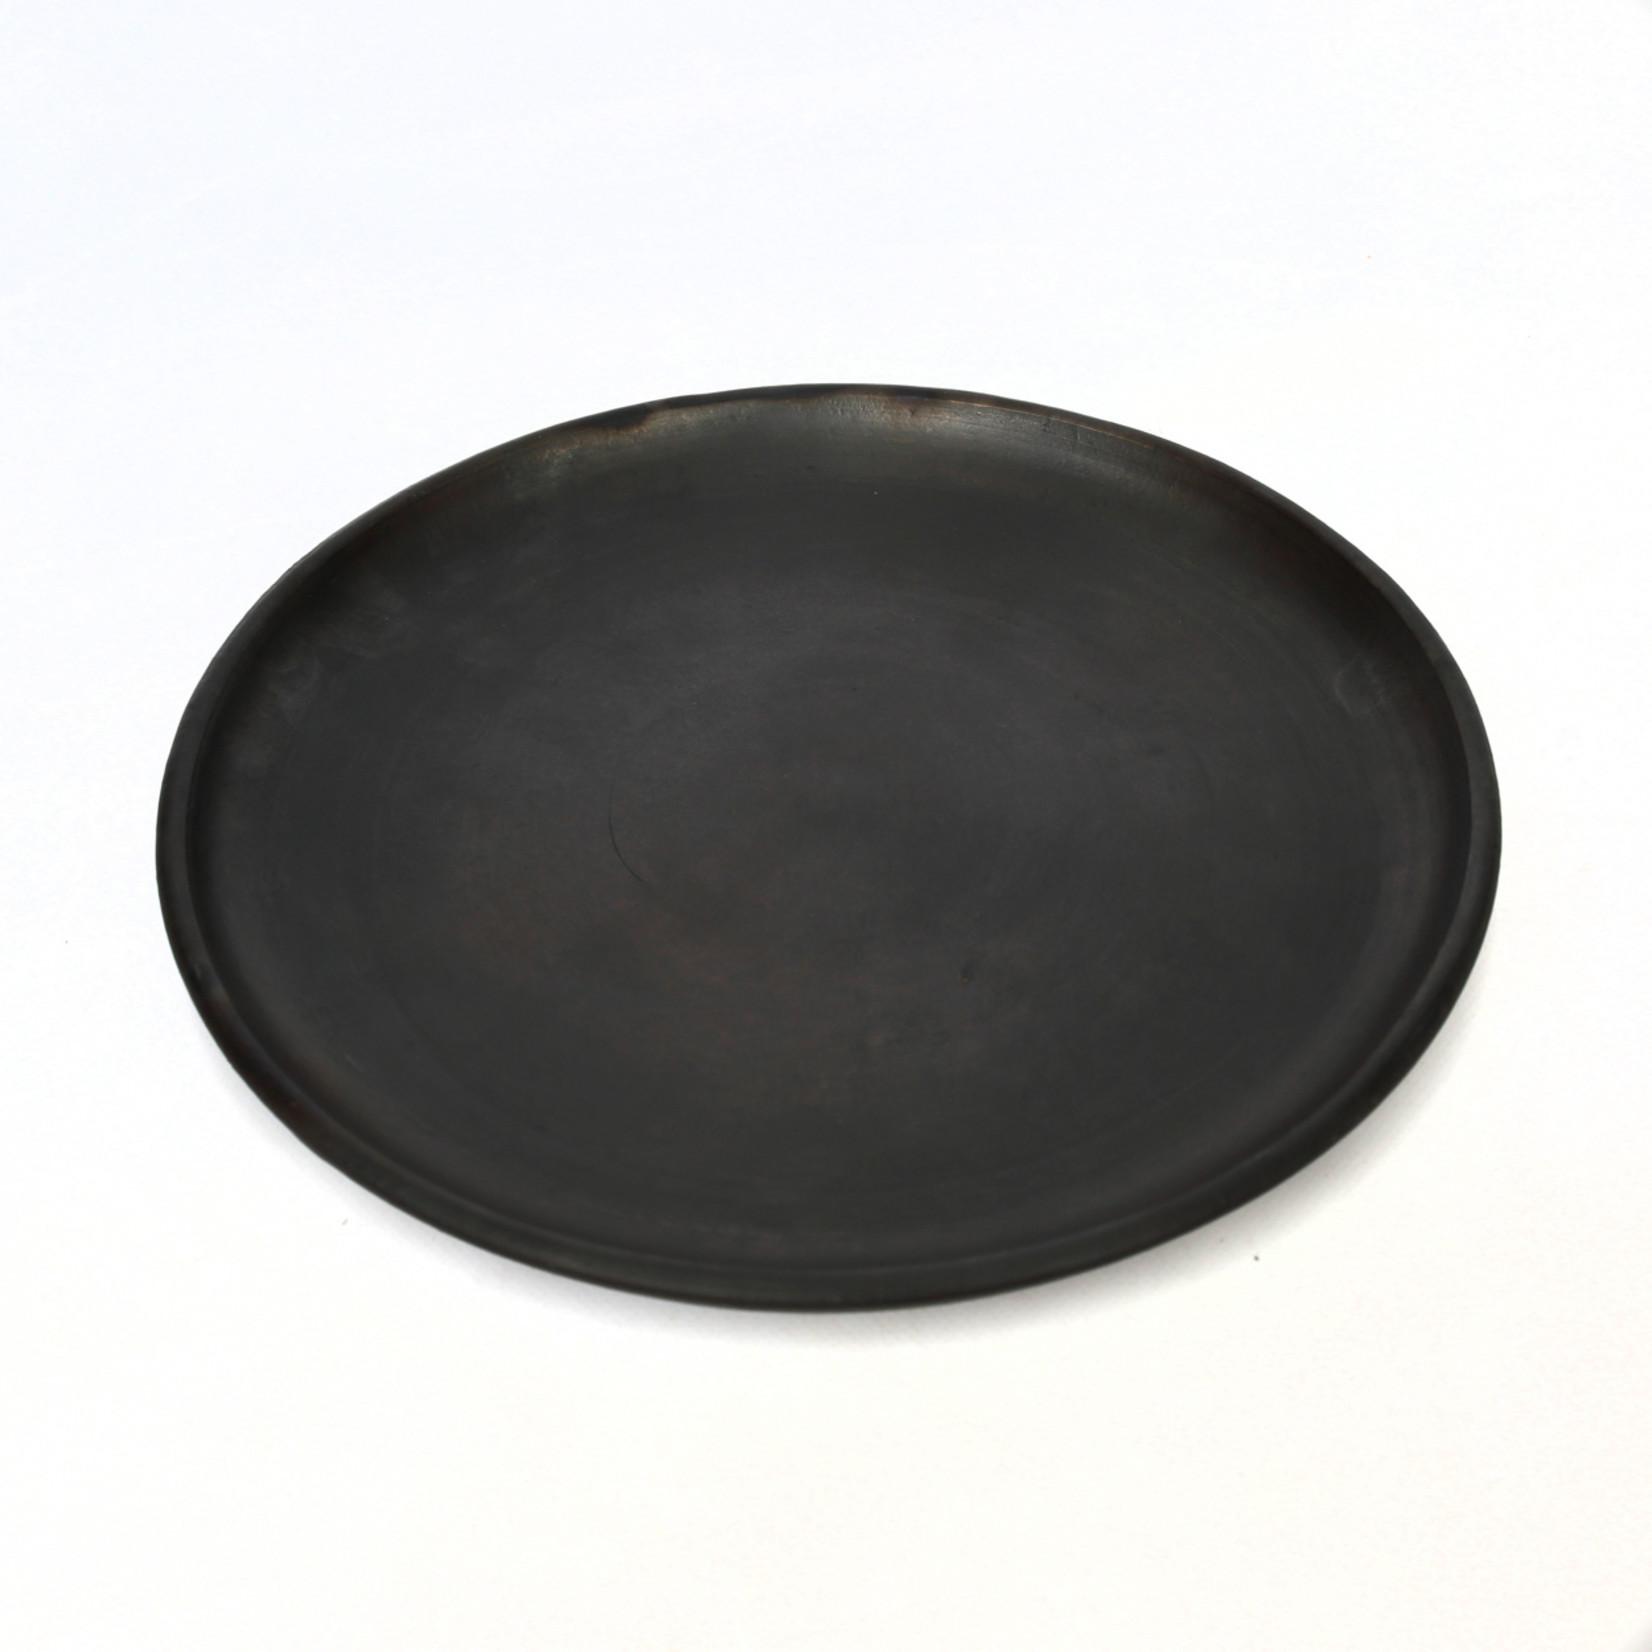 Bazar Bizar The Burned Classic Plate - Black - L